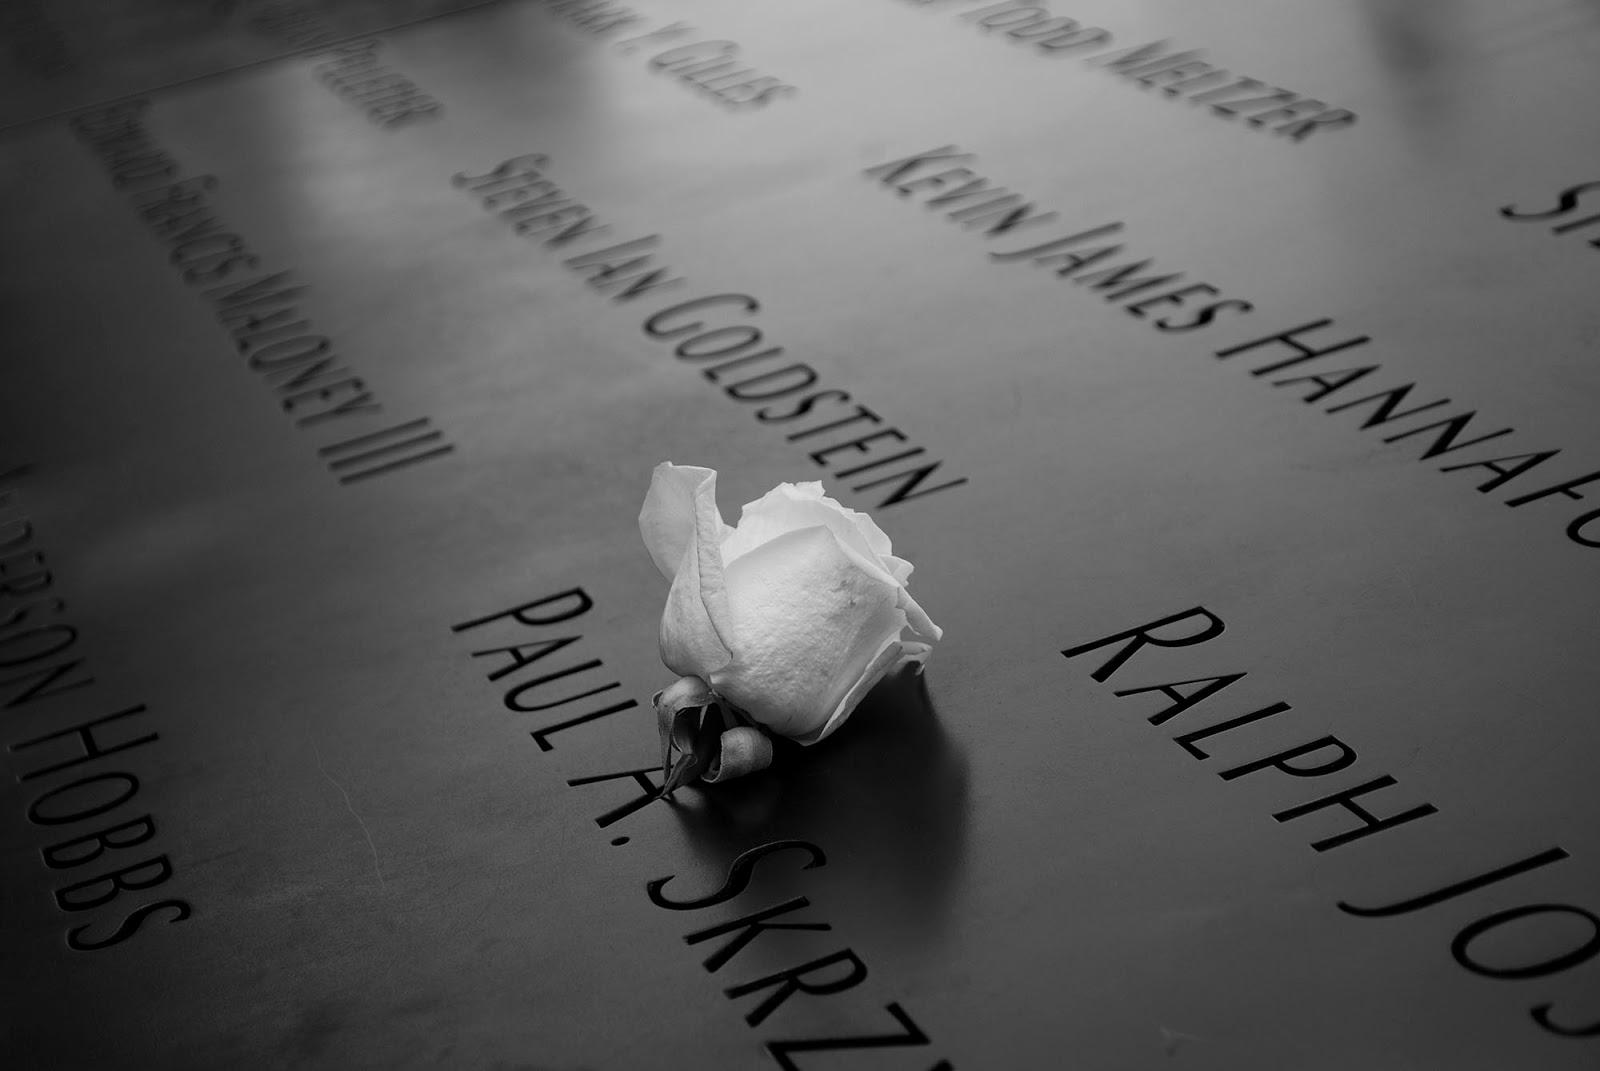 north south pool wtc 911 memorial white rose